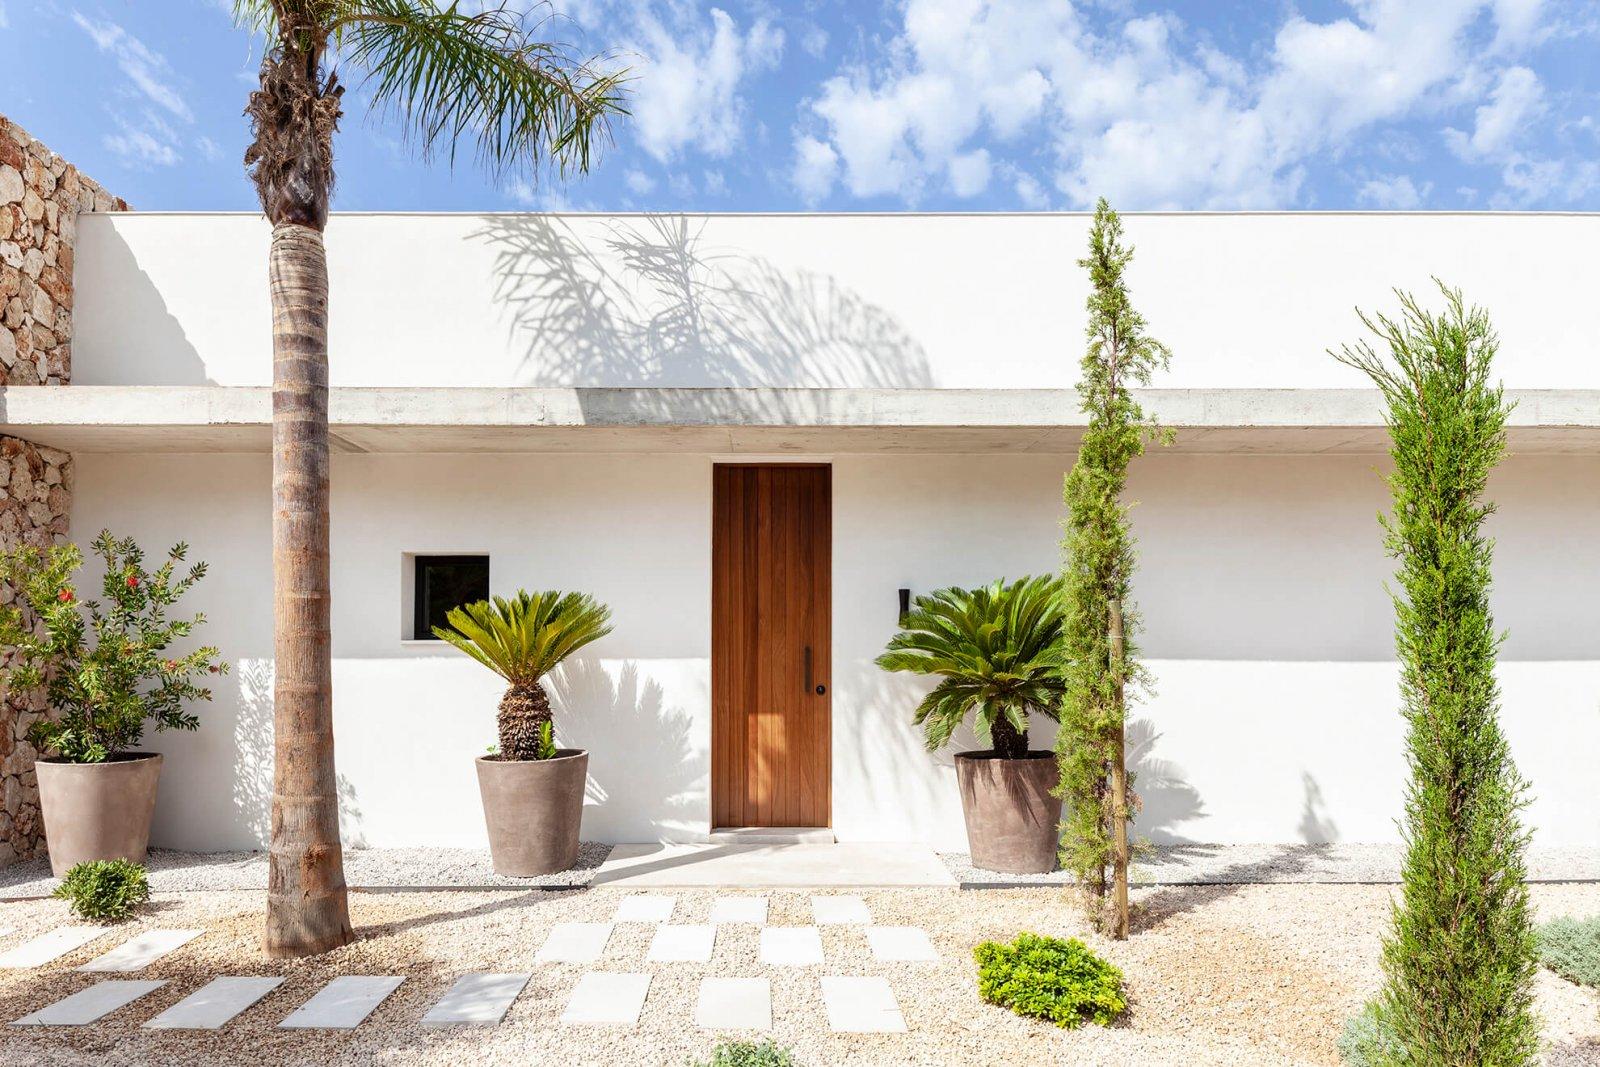 Facade of the inner garden with wooden door and palm trees of the Sol de Mallorca house